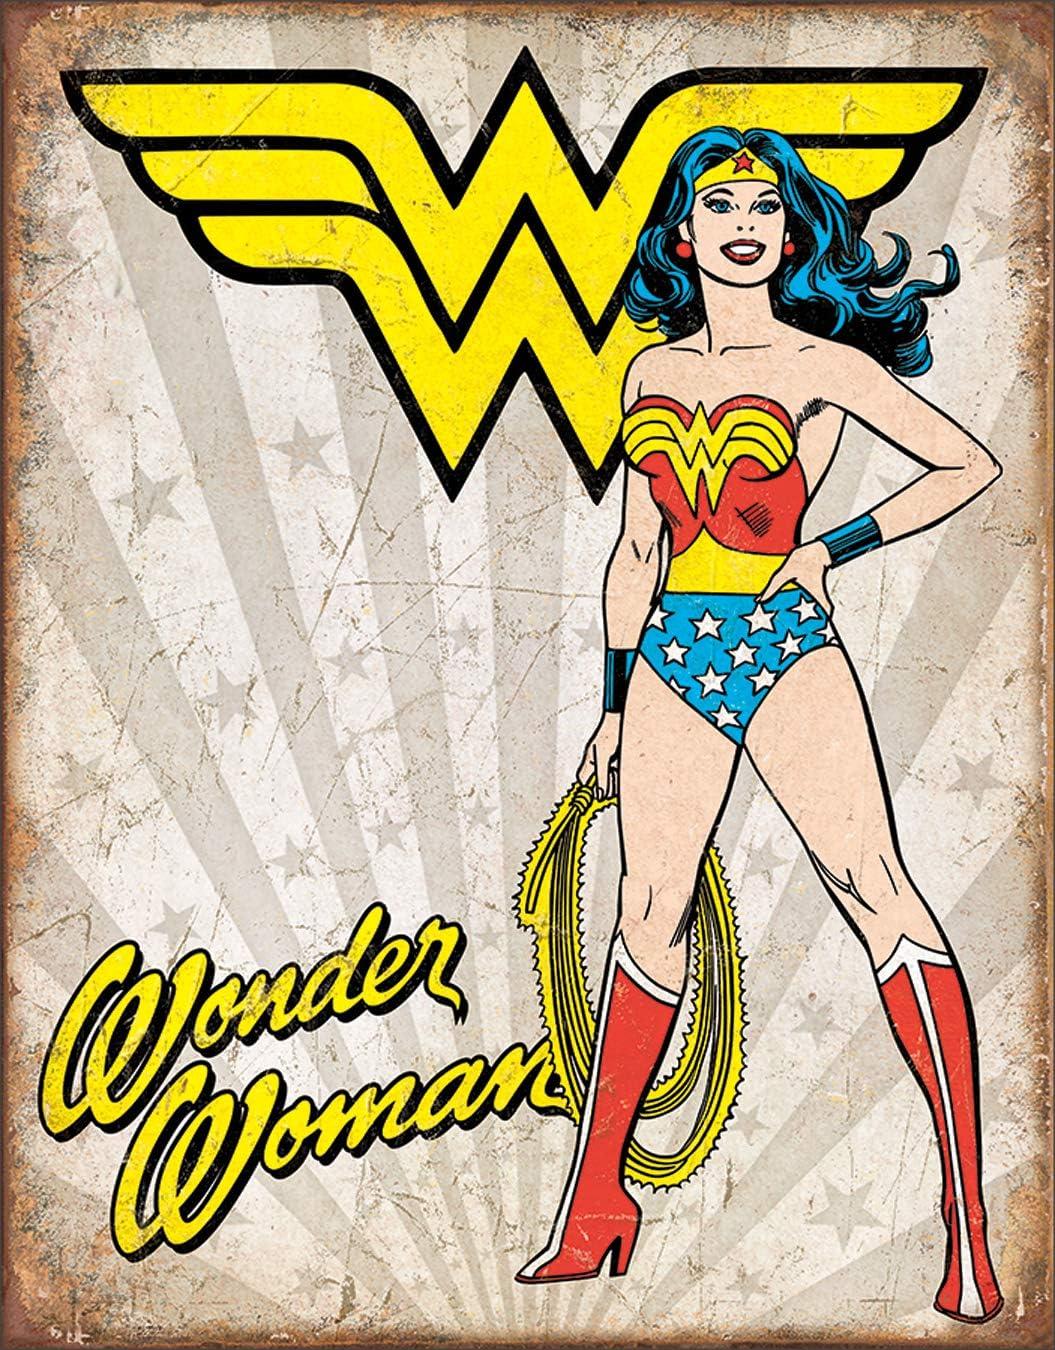 "Desperate Enterprises Wonder Woman Heroic Tin Sign, 12.5"" W x 16"" H"